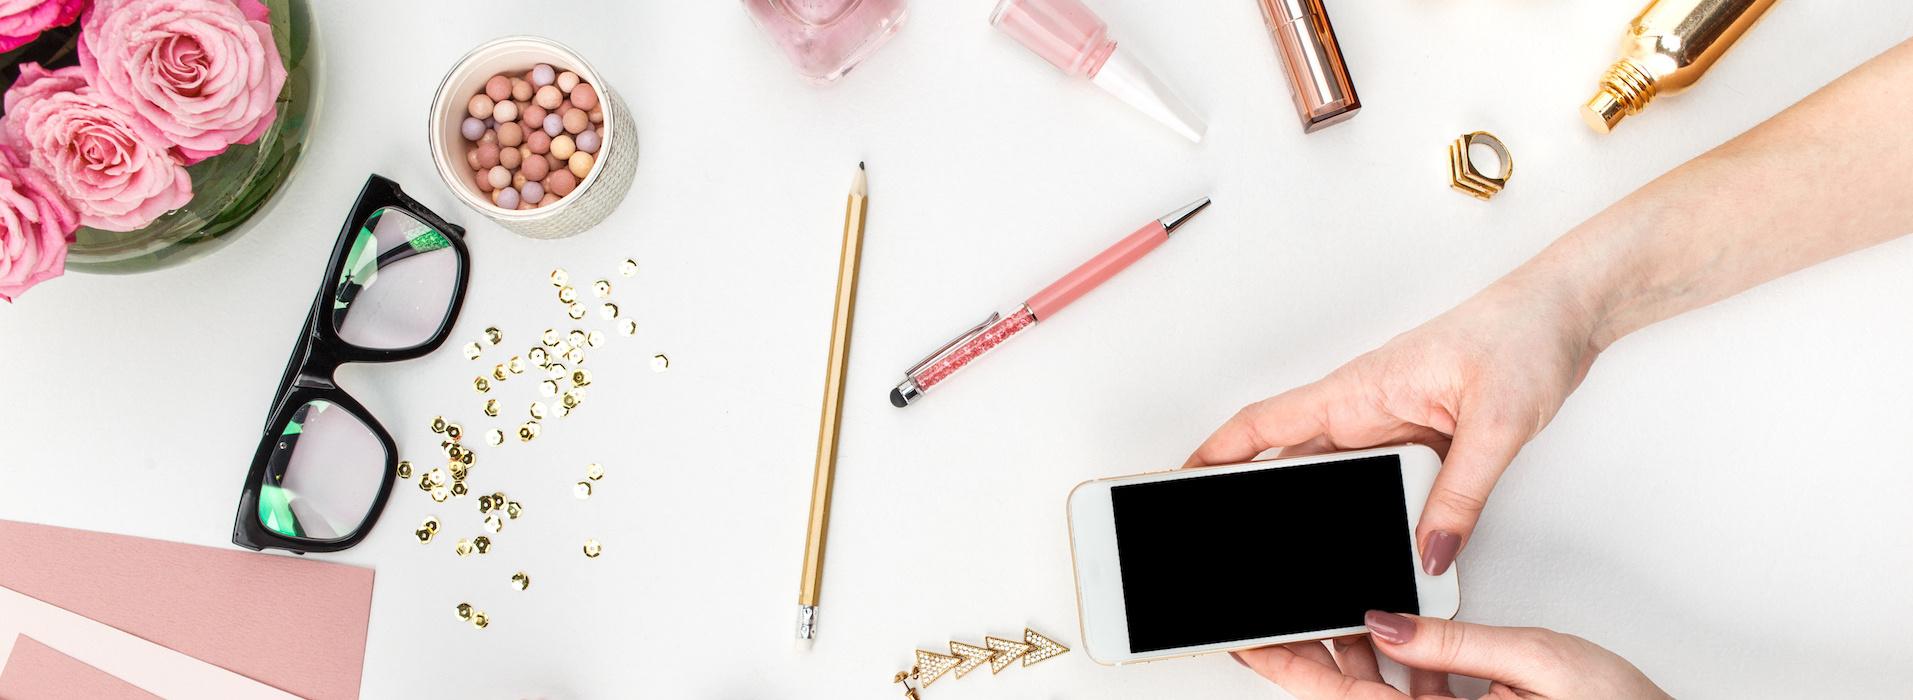 Beauty-Shop-Smartphone-Accessoires-Headerbild